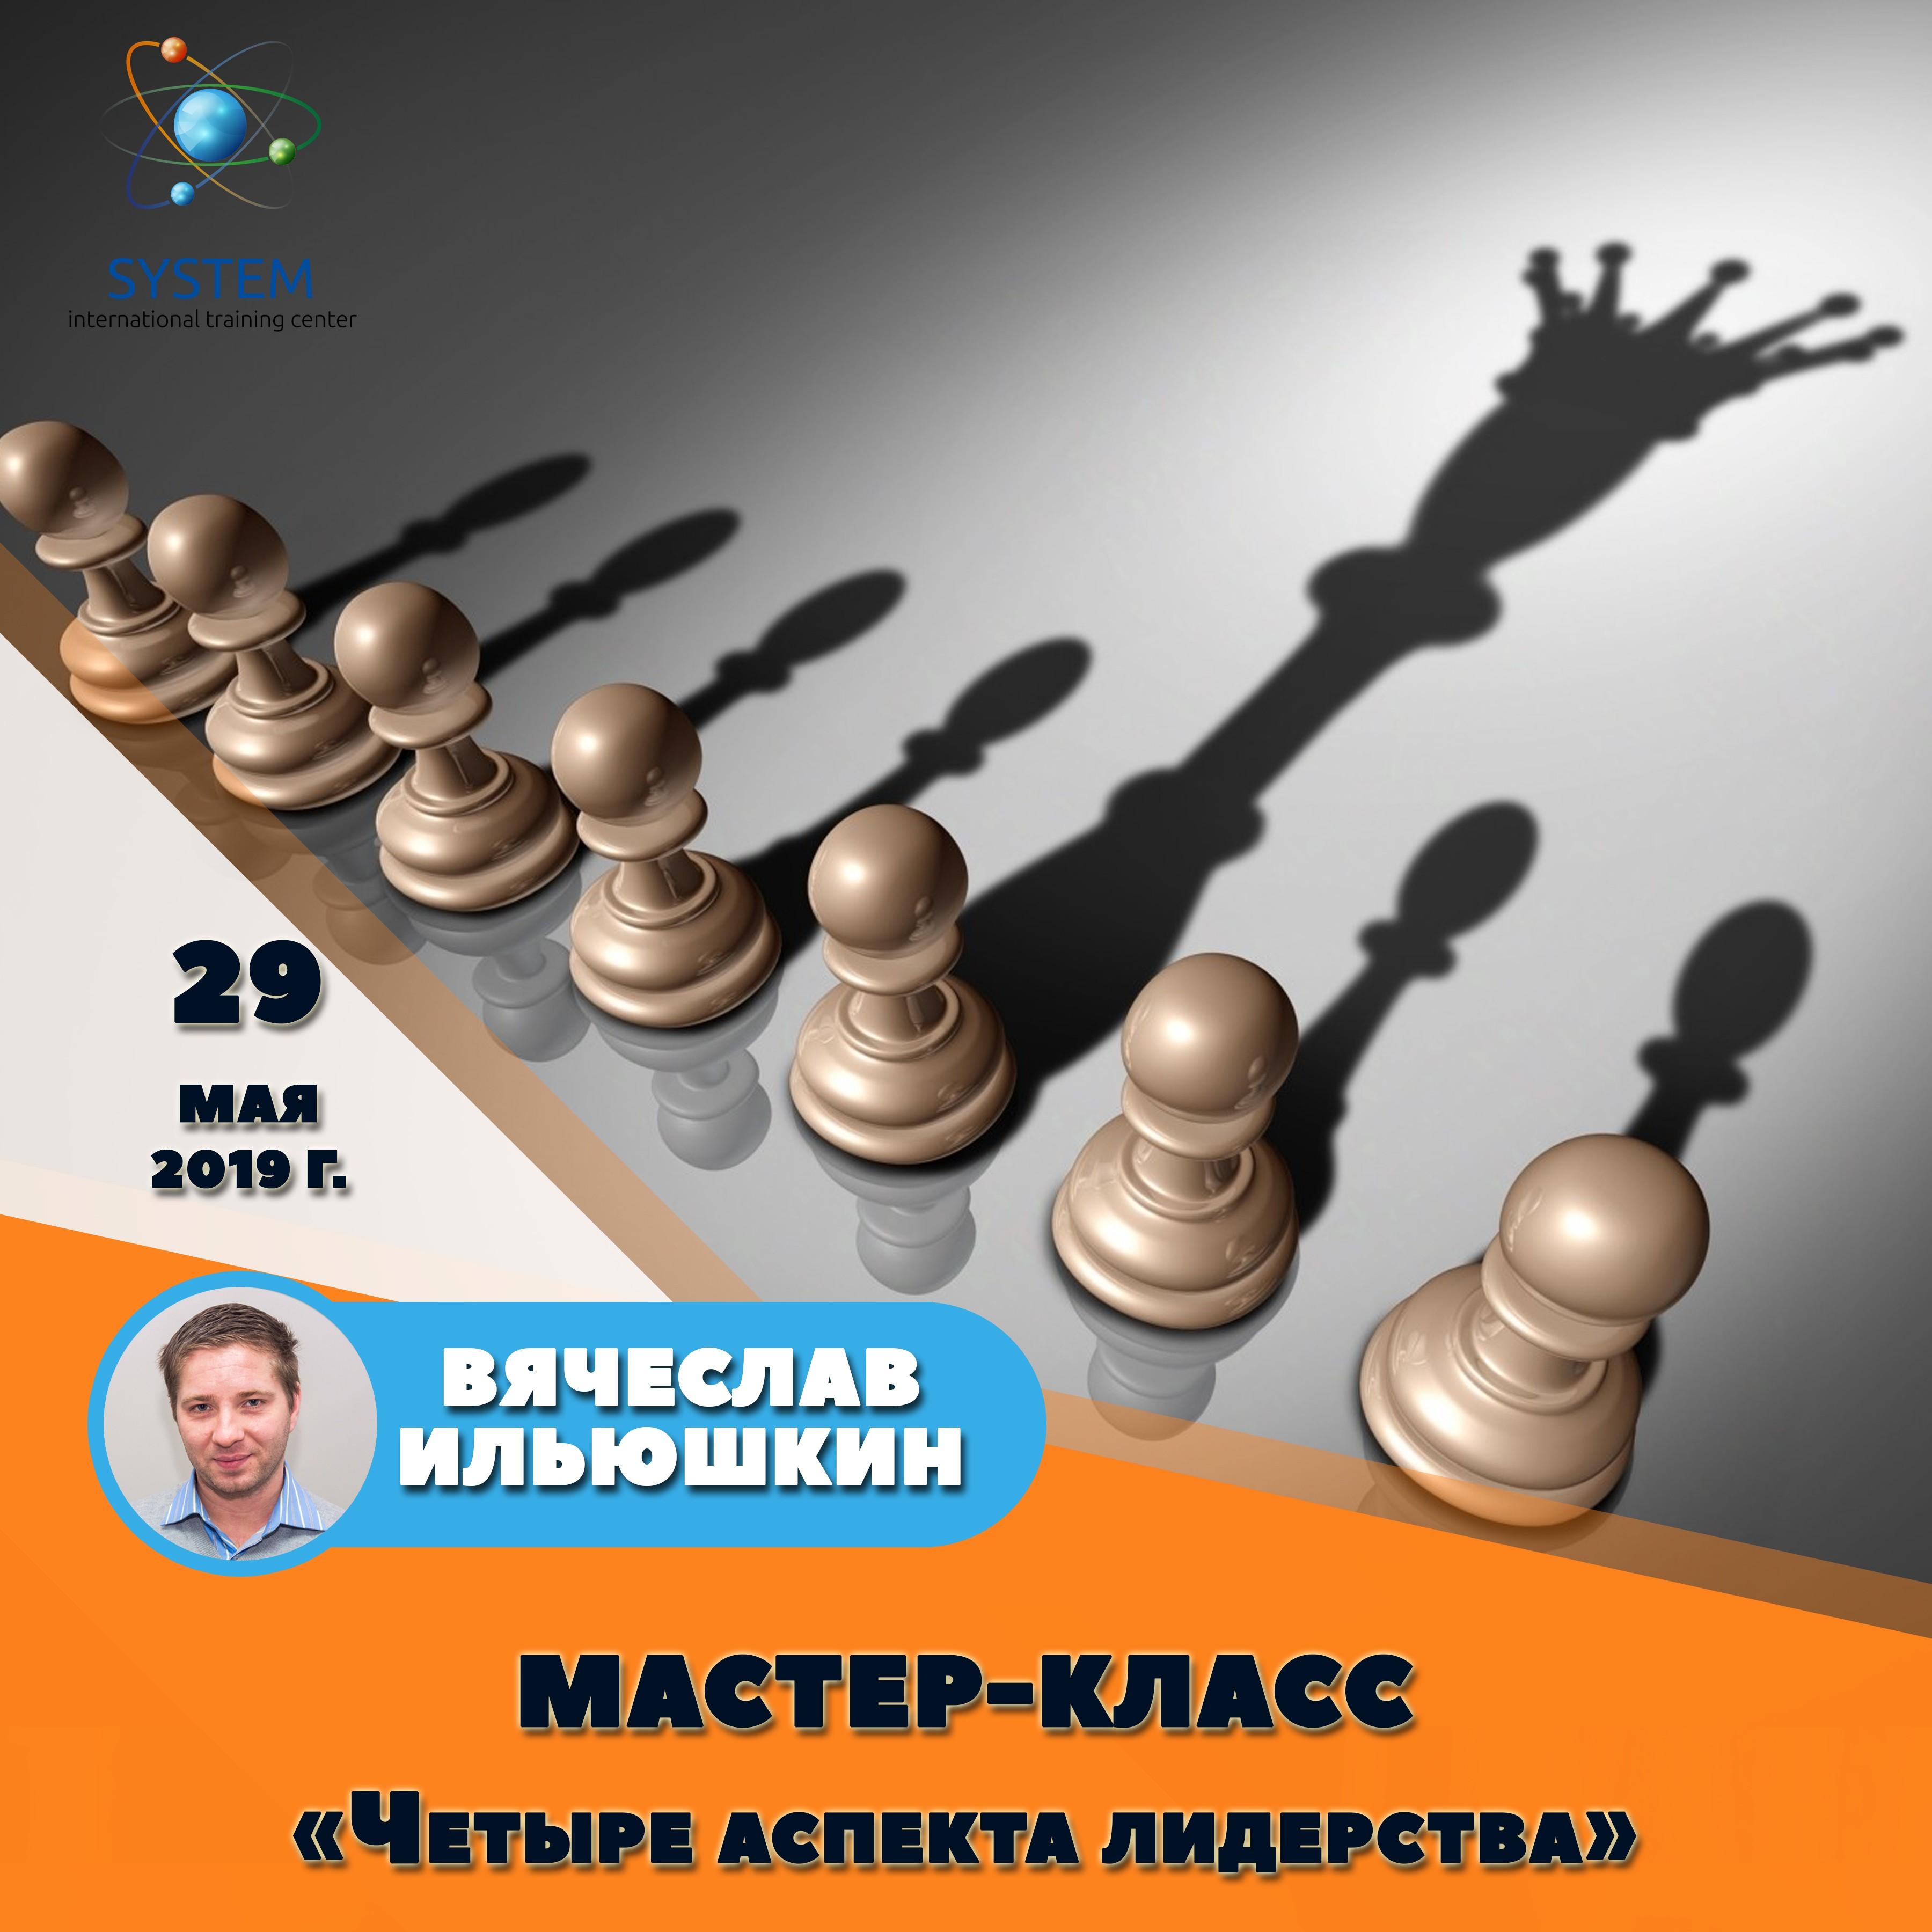 Мастер-класс «Четыре аспекта лидерства» @ Владивосток, ул. Жигура, 26а, БЦ «Seven», ауд. 2-7, зал «System ITC»